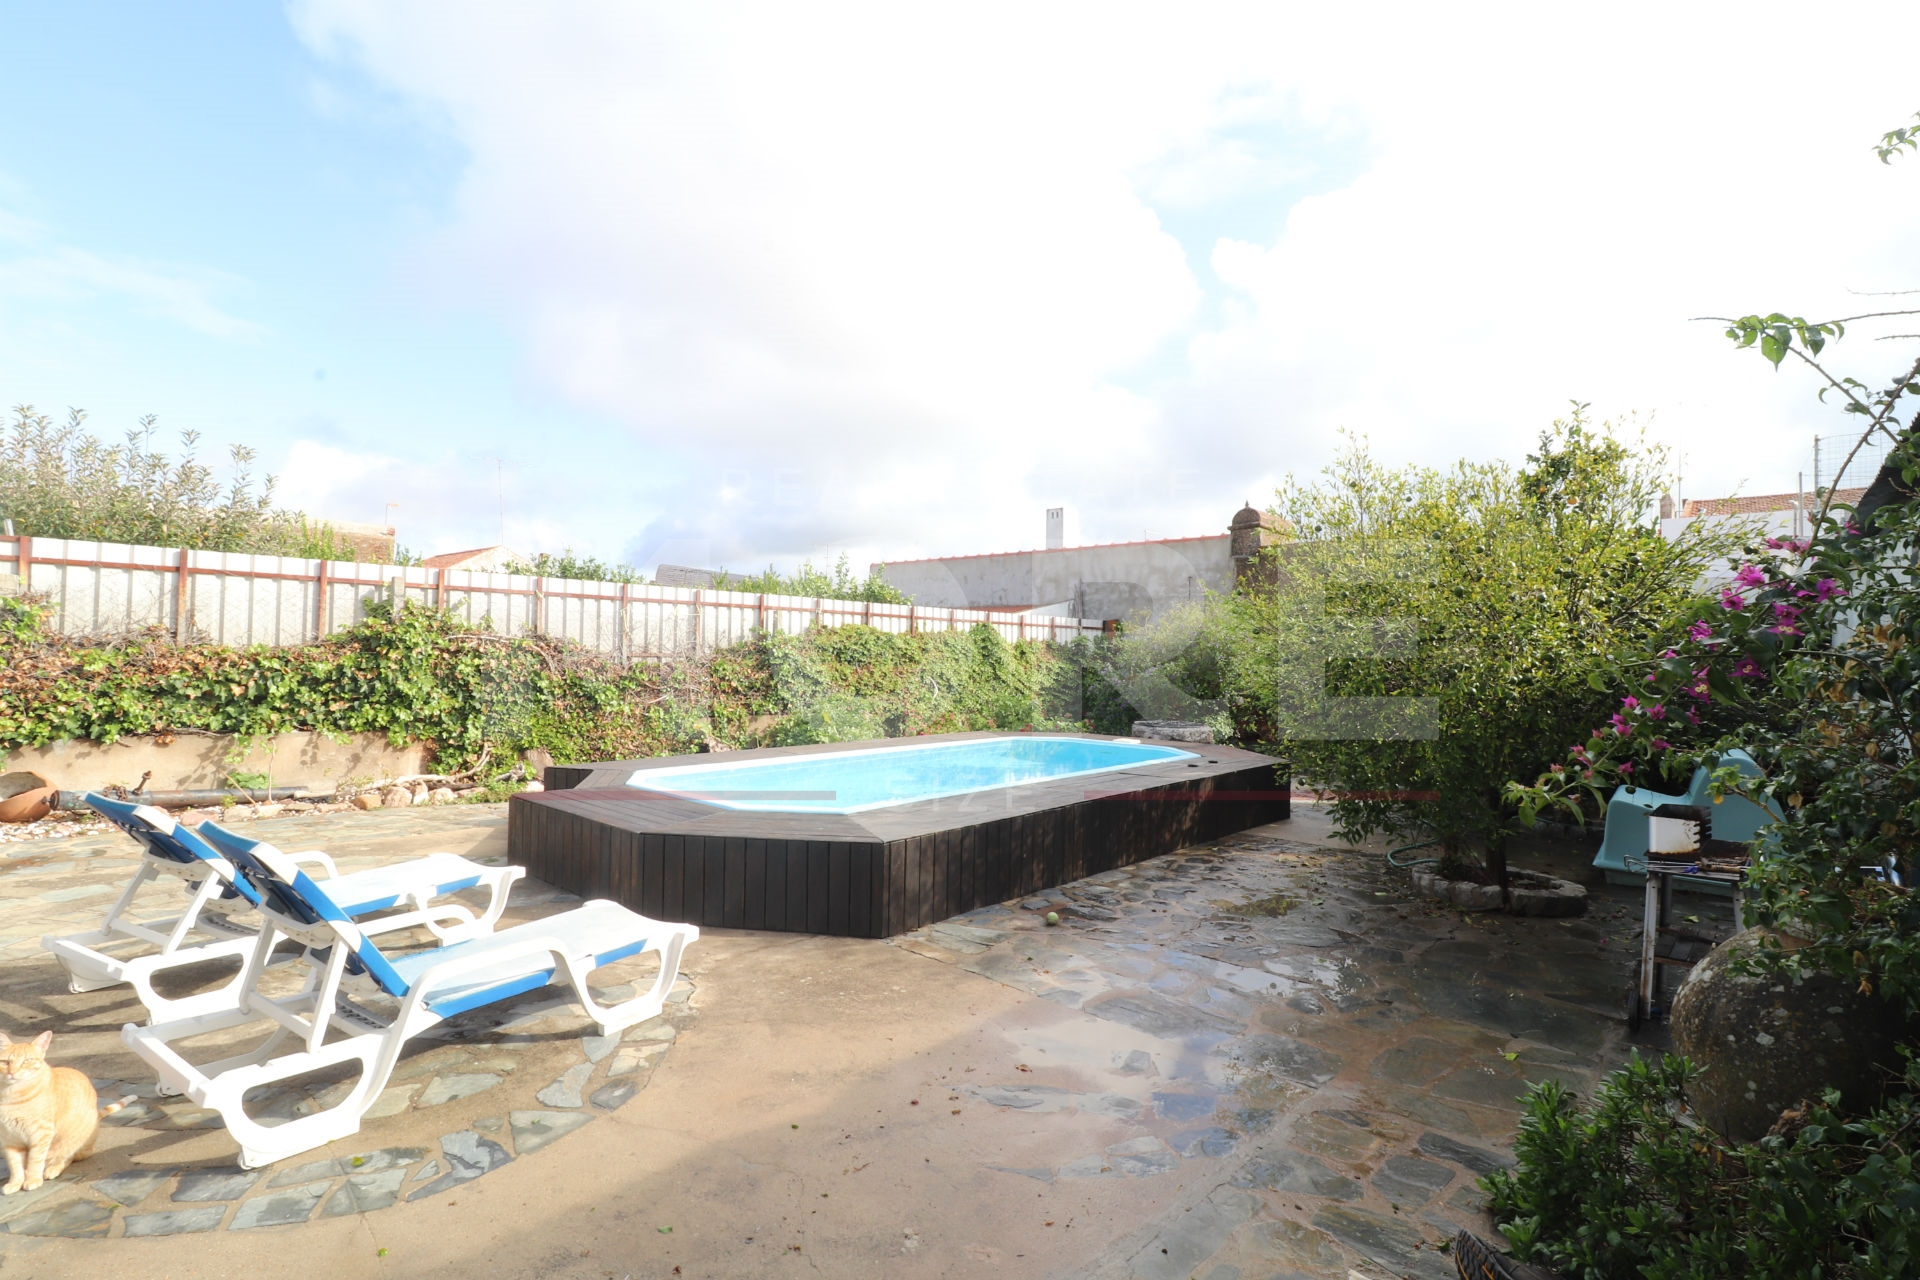 Moradia T7 com piscina - Azaruja - Évora, Évora, Évora